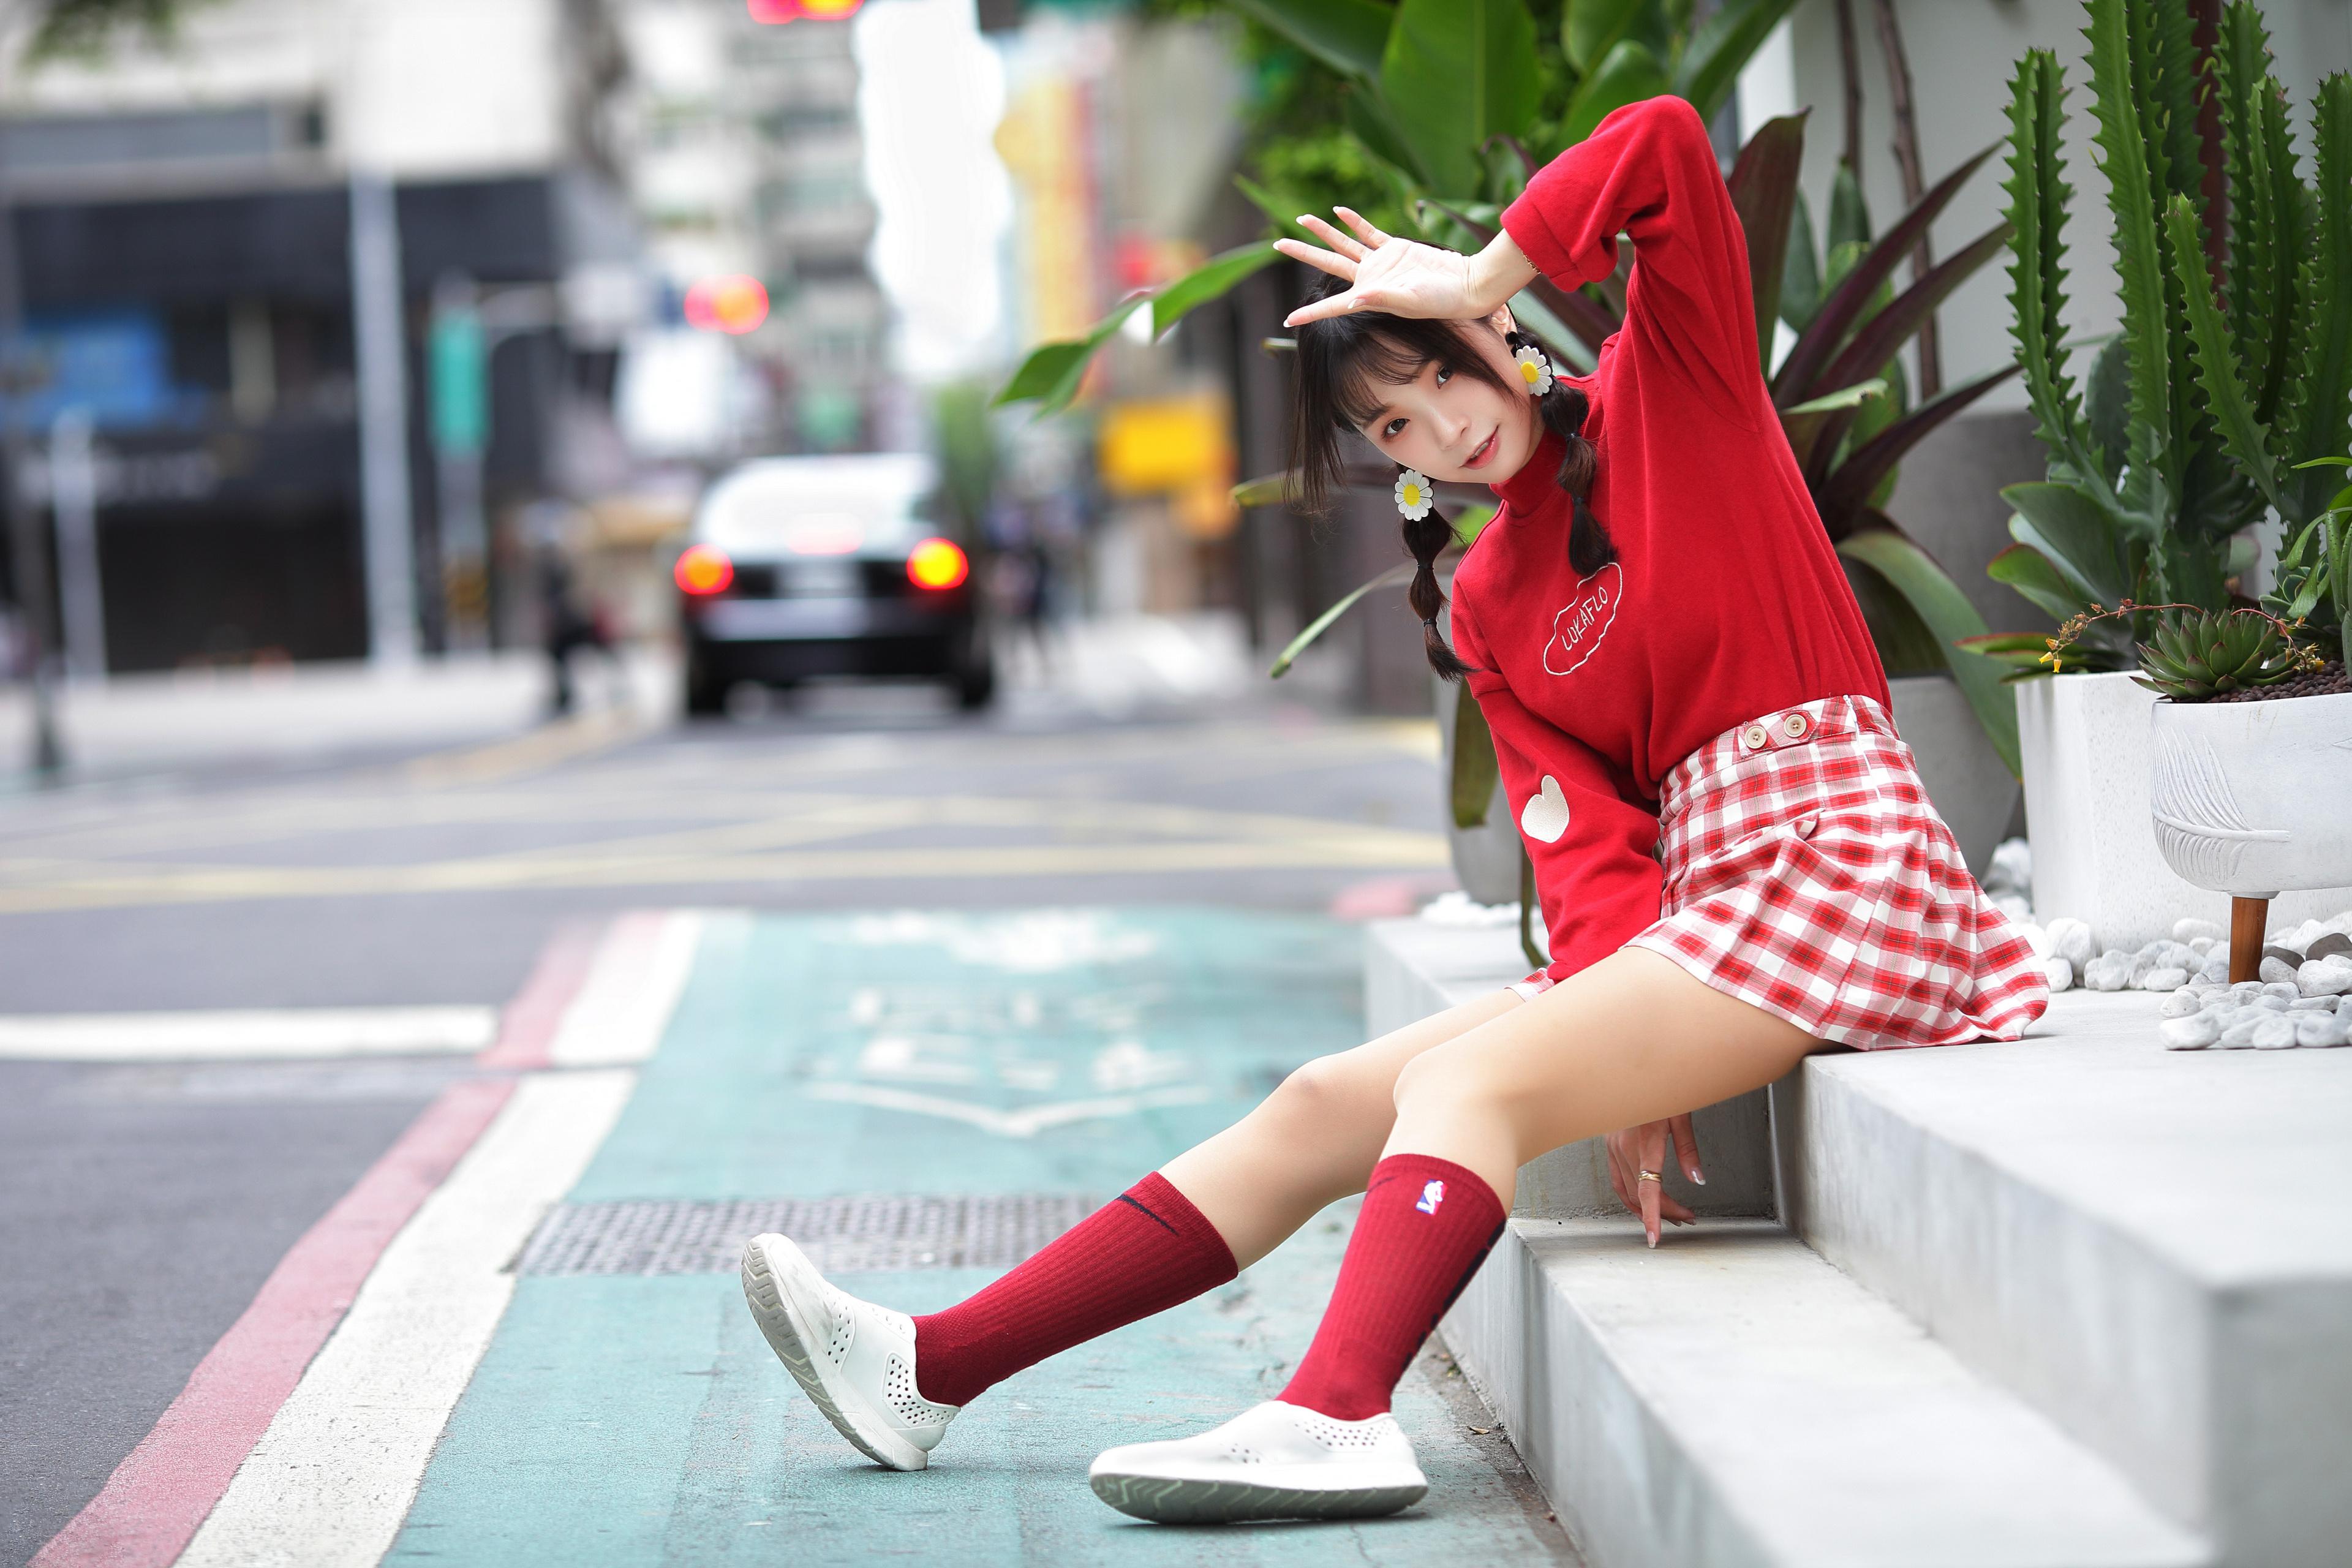 Asian Women Model Long Hair Dark Hair Twintails Braided Hair Red Socks Sneakers Skirt Sitting Stairs 3840x2560